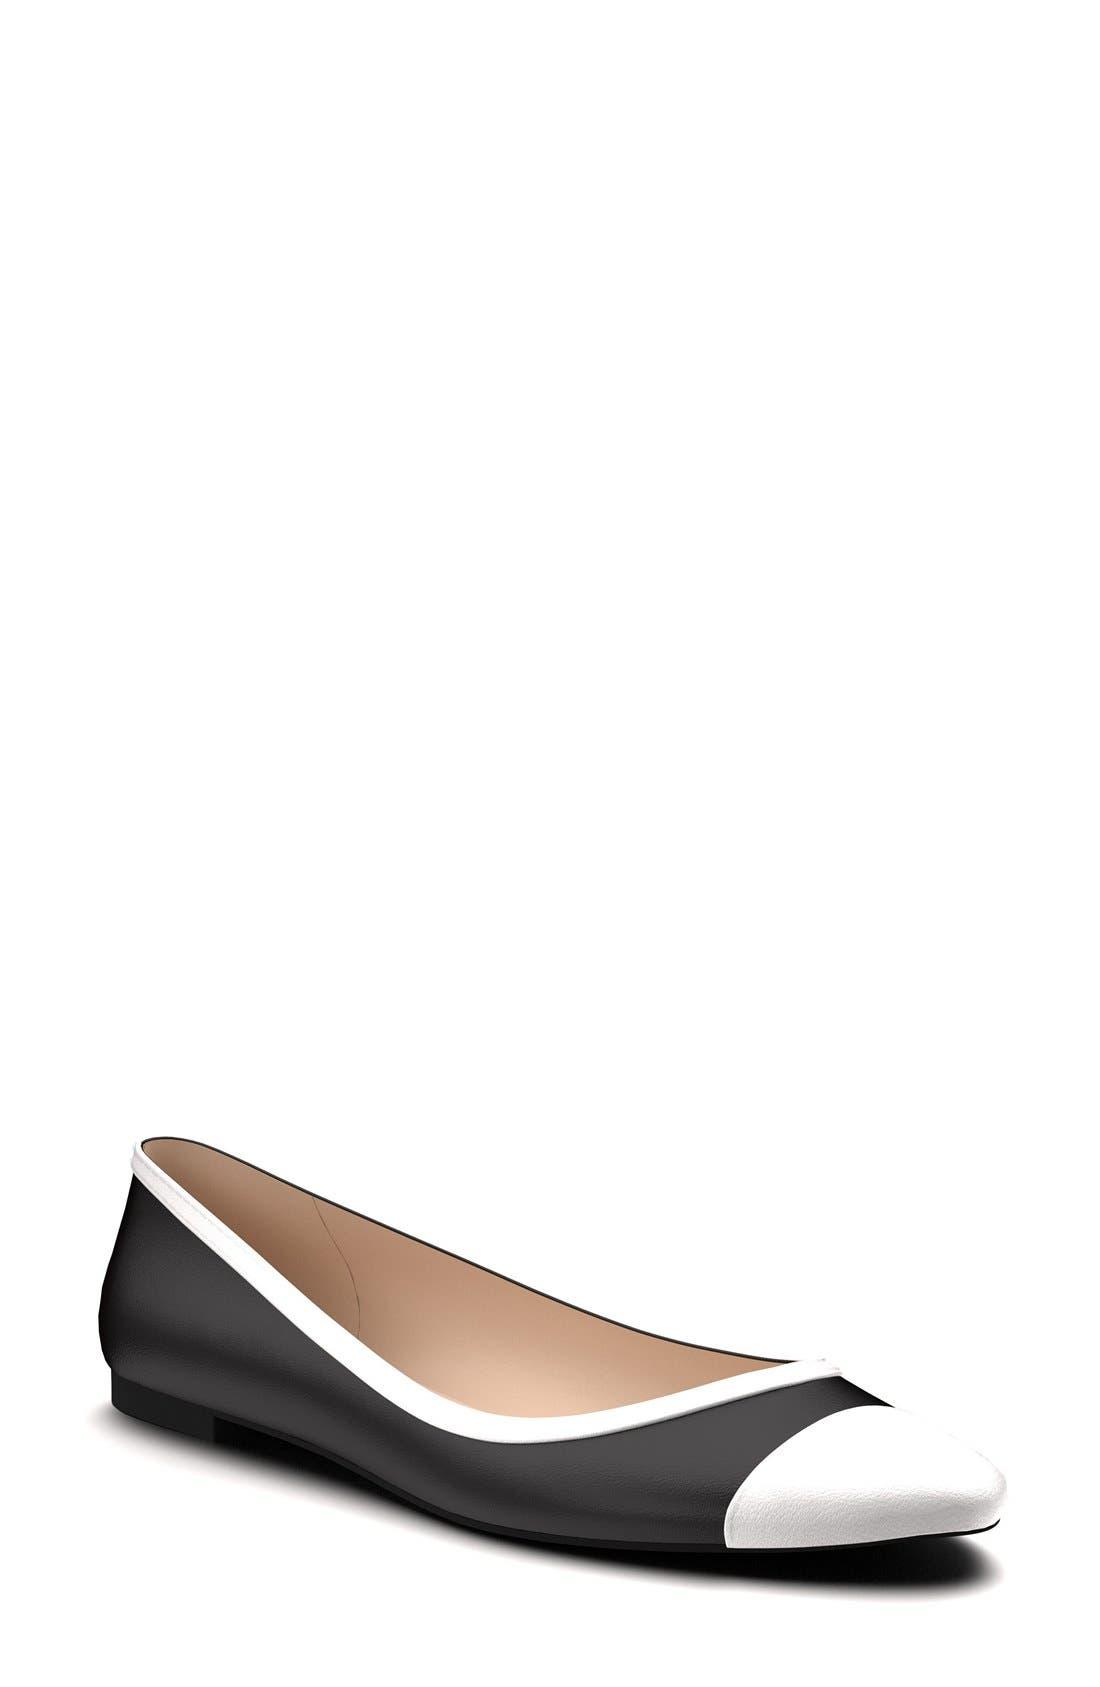 Main Image - Shoes of Prey Cap Toe Flat (Women)